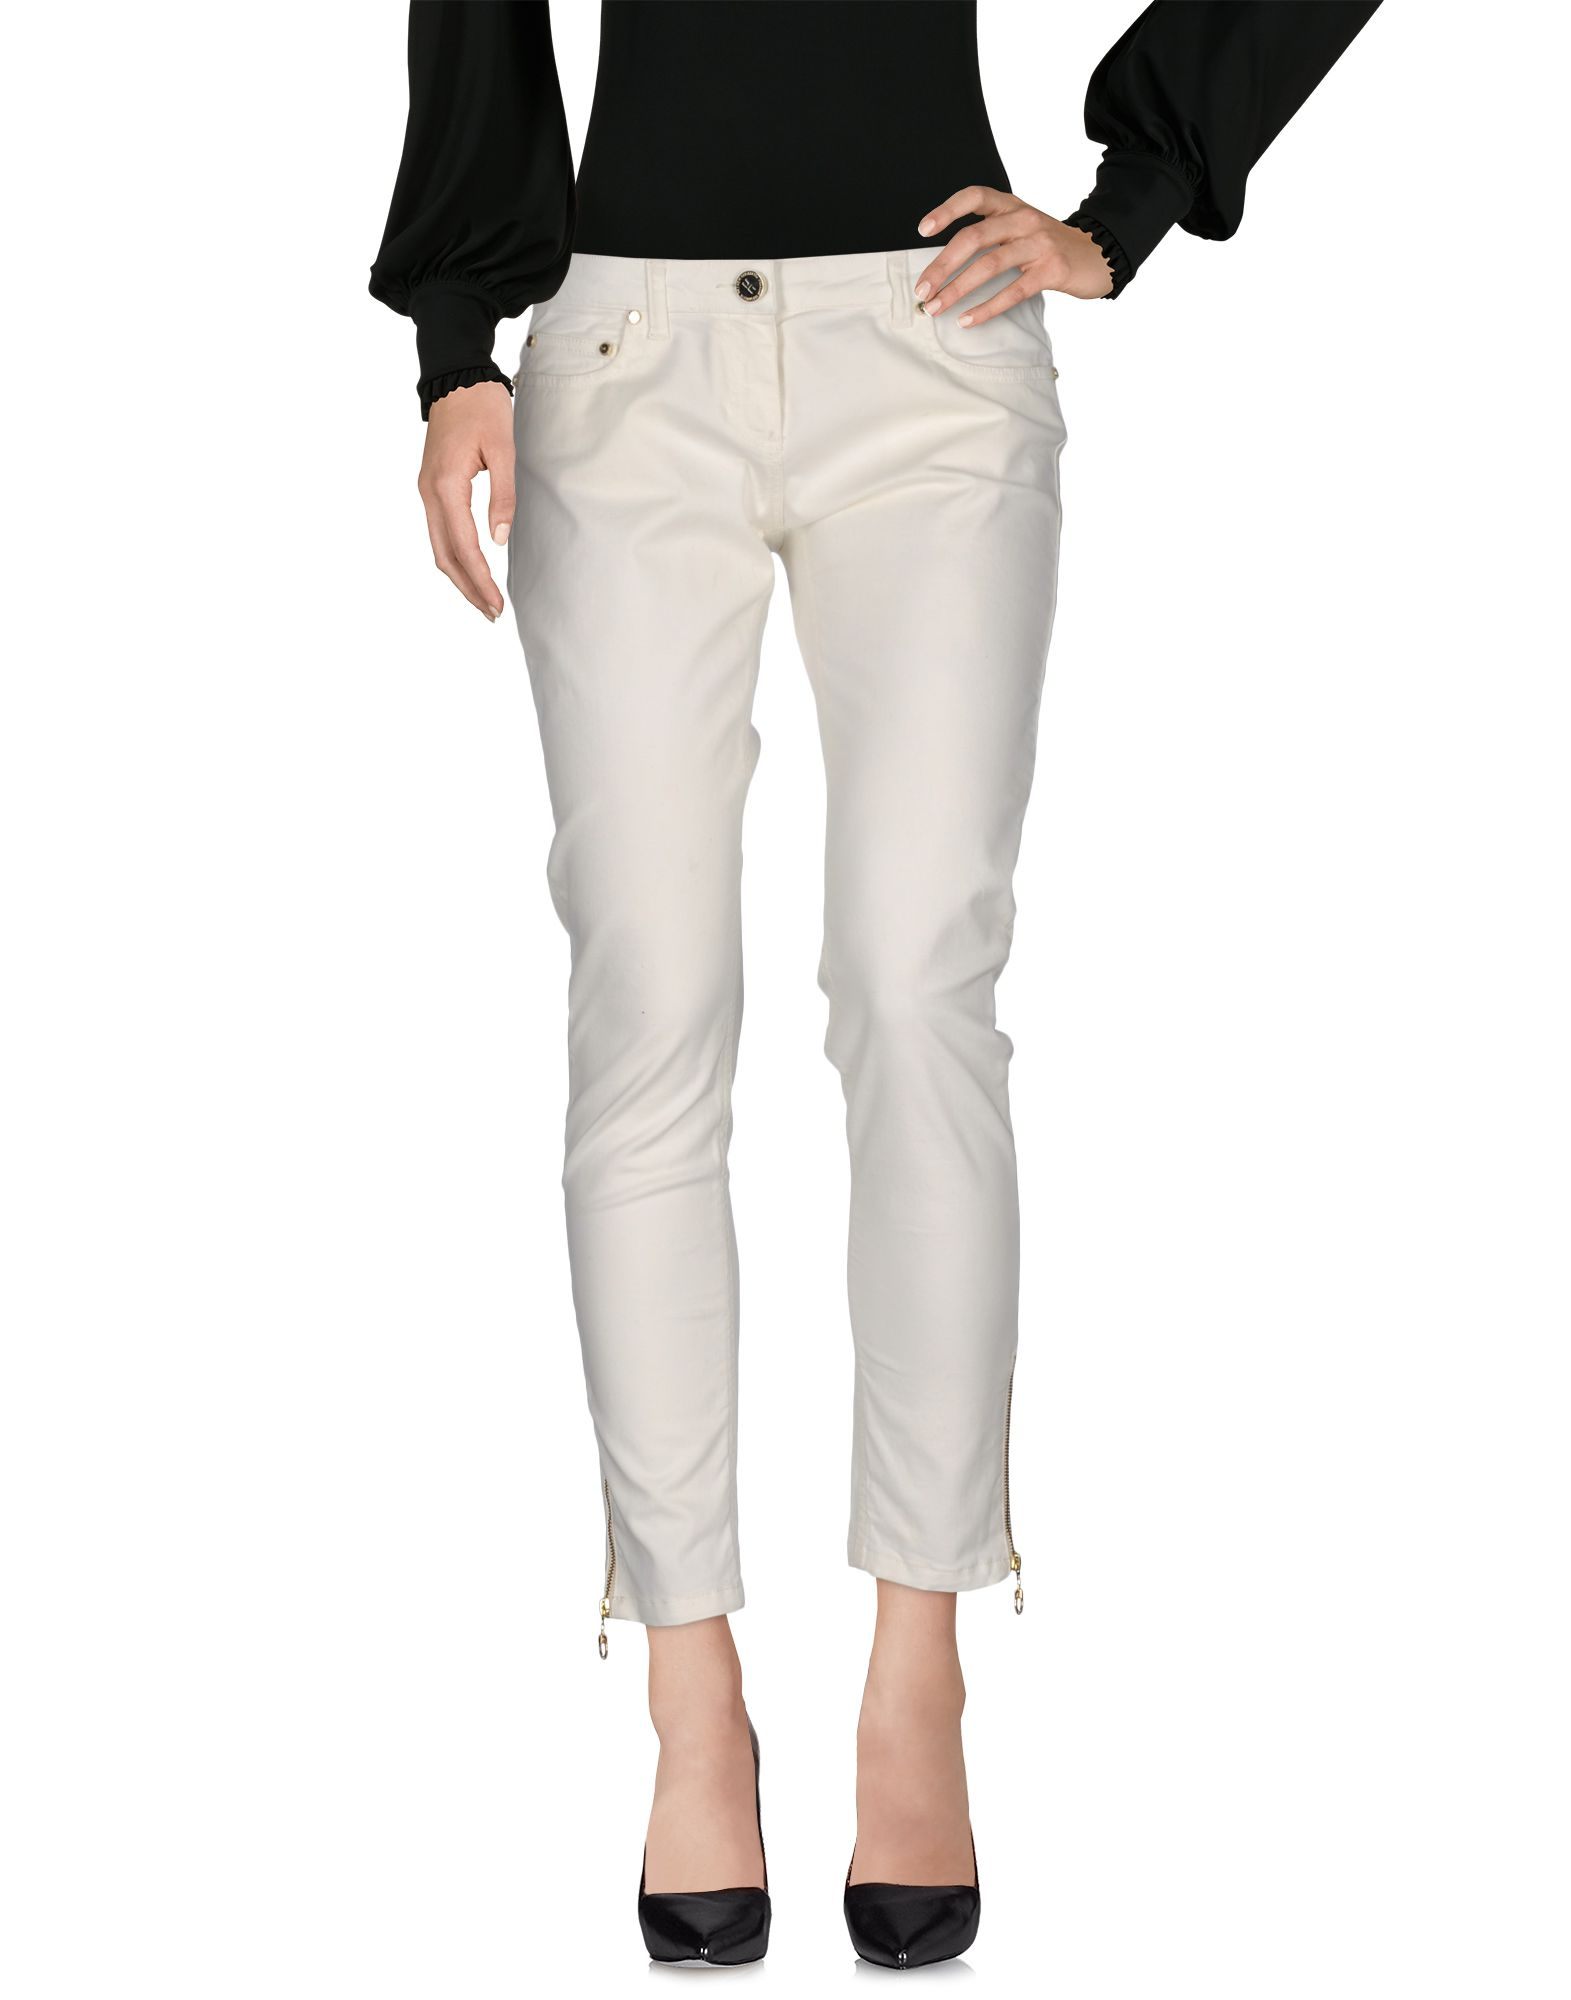 ELISABETTA FRANCHI JEANS for CELYN B. Повседневные брюки elisabetta franchi jeans футболка